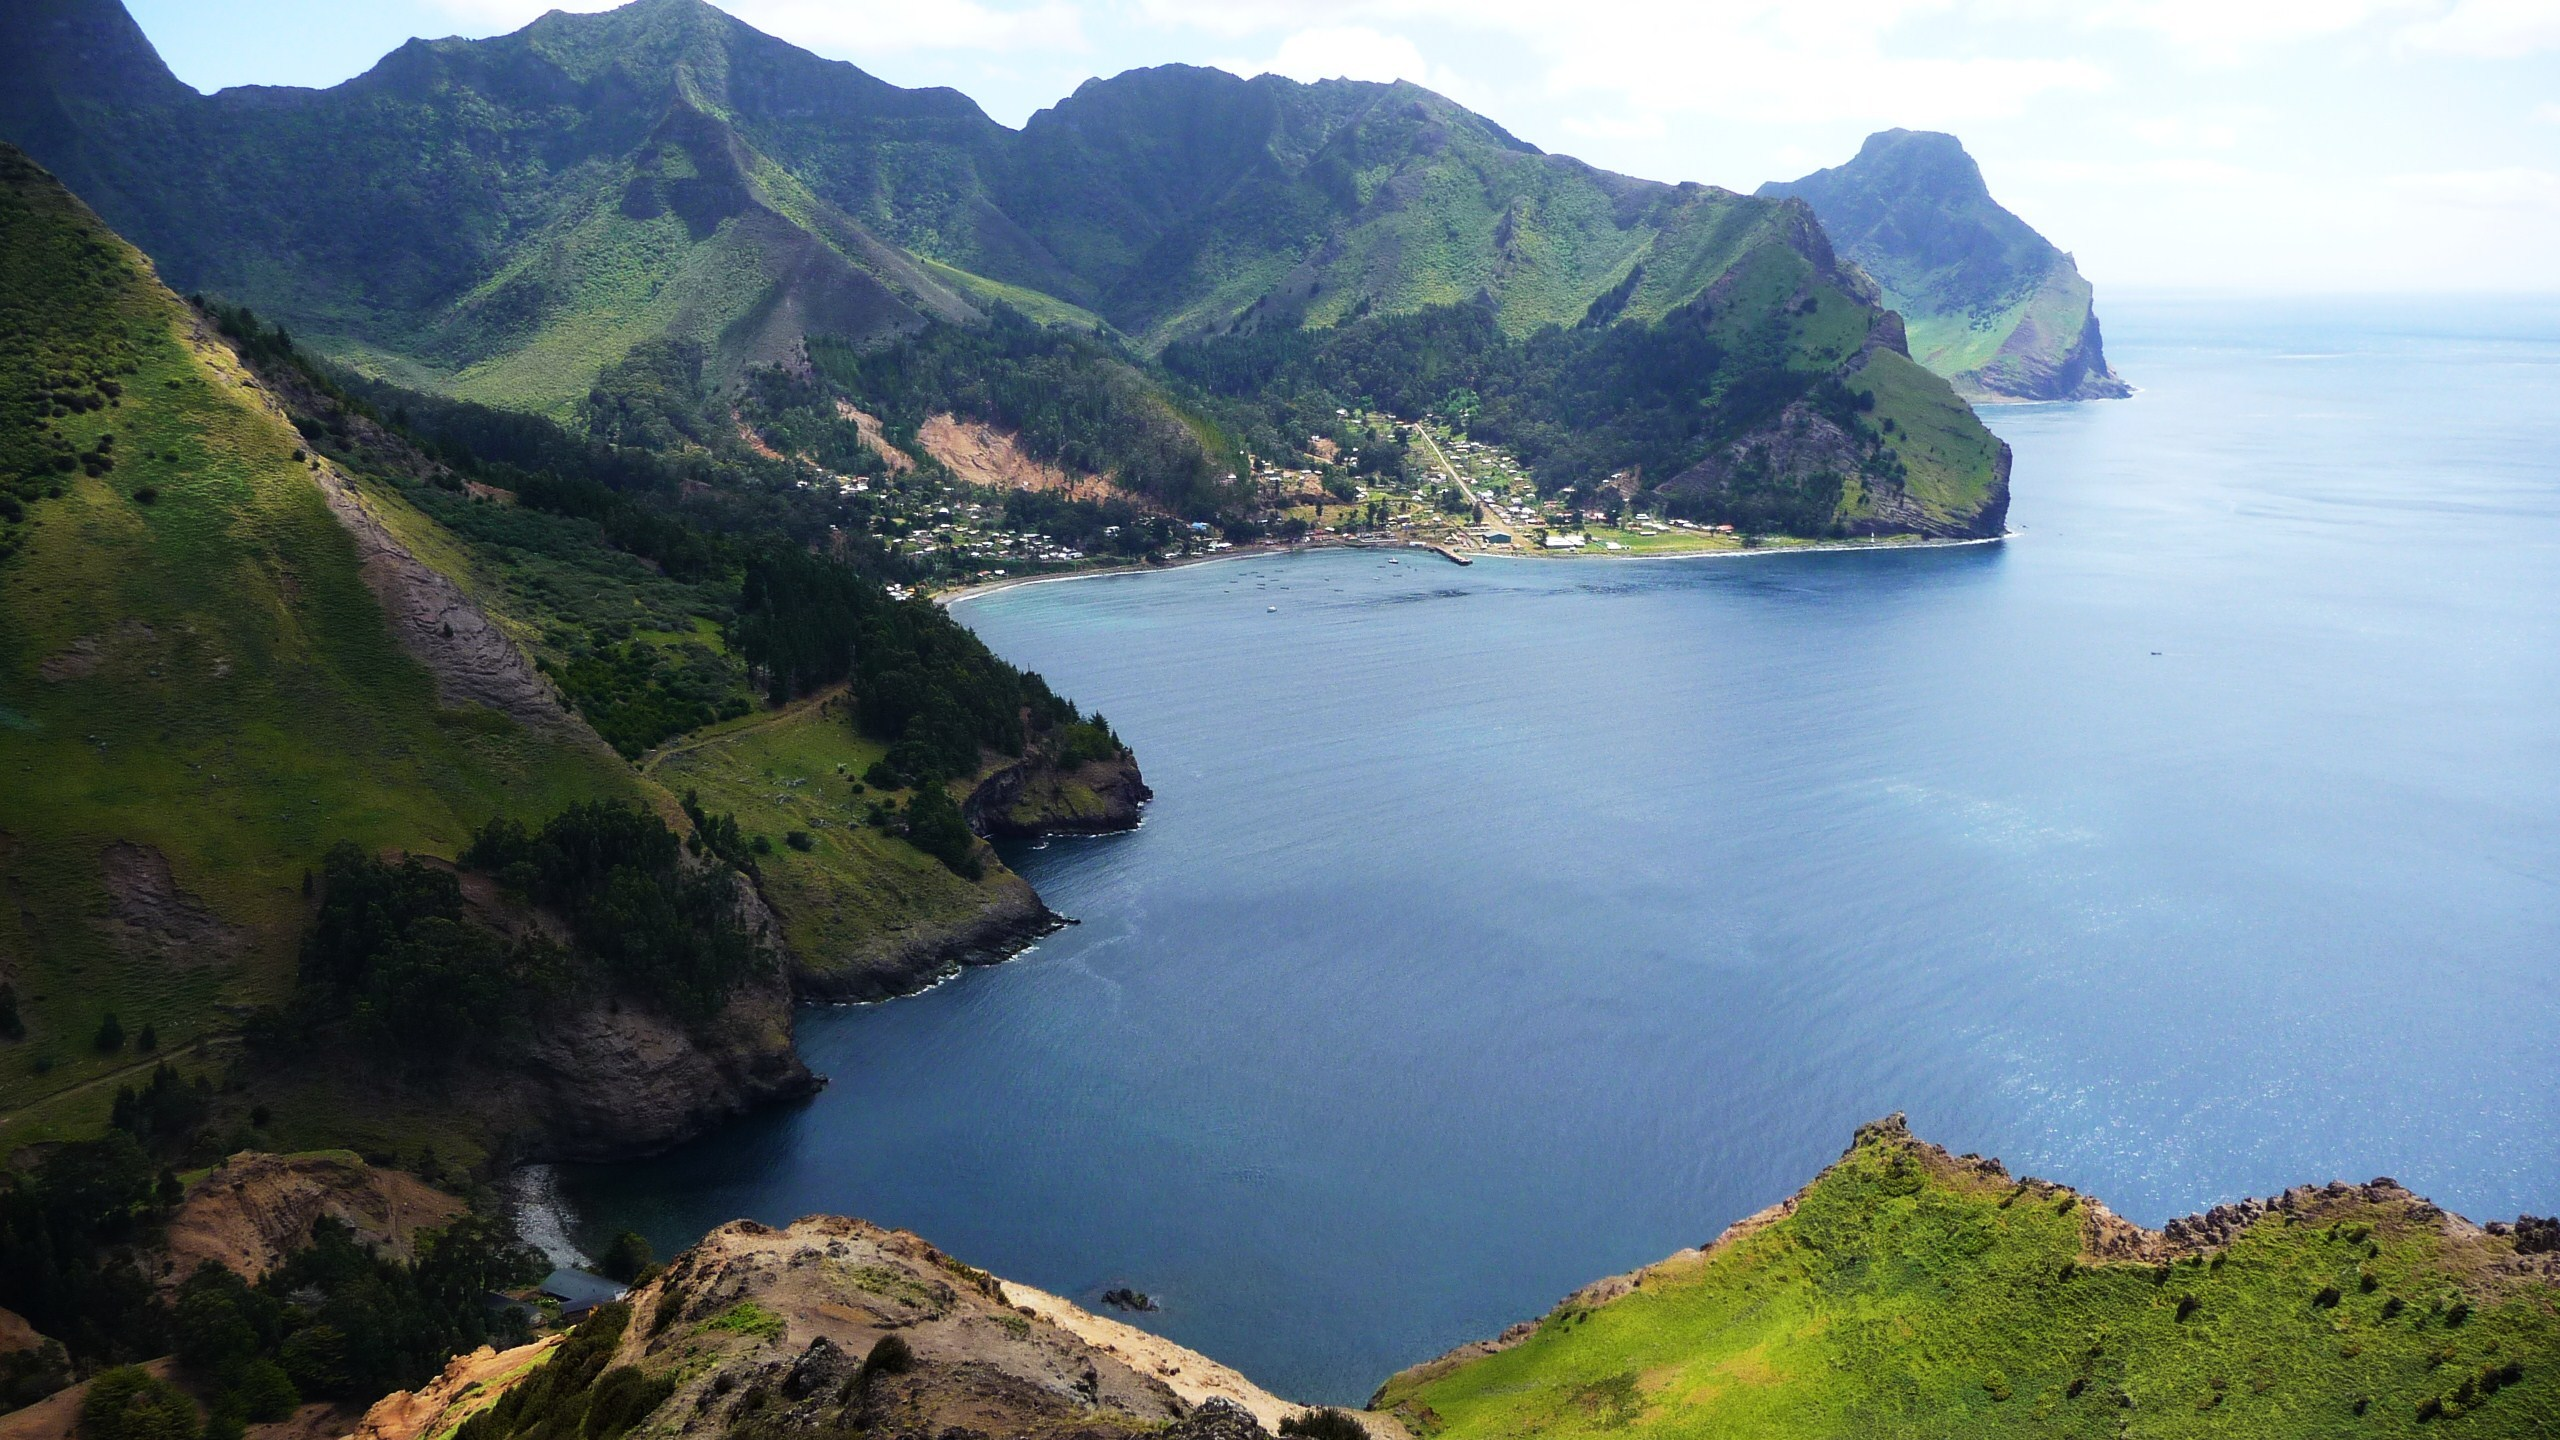 archipielago juan fernandez